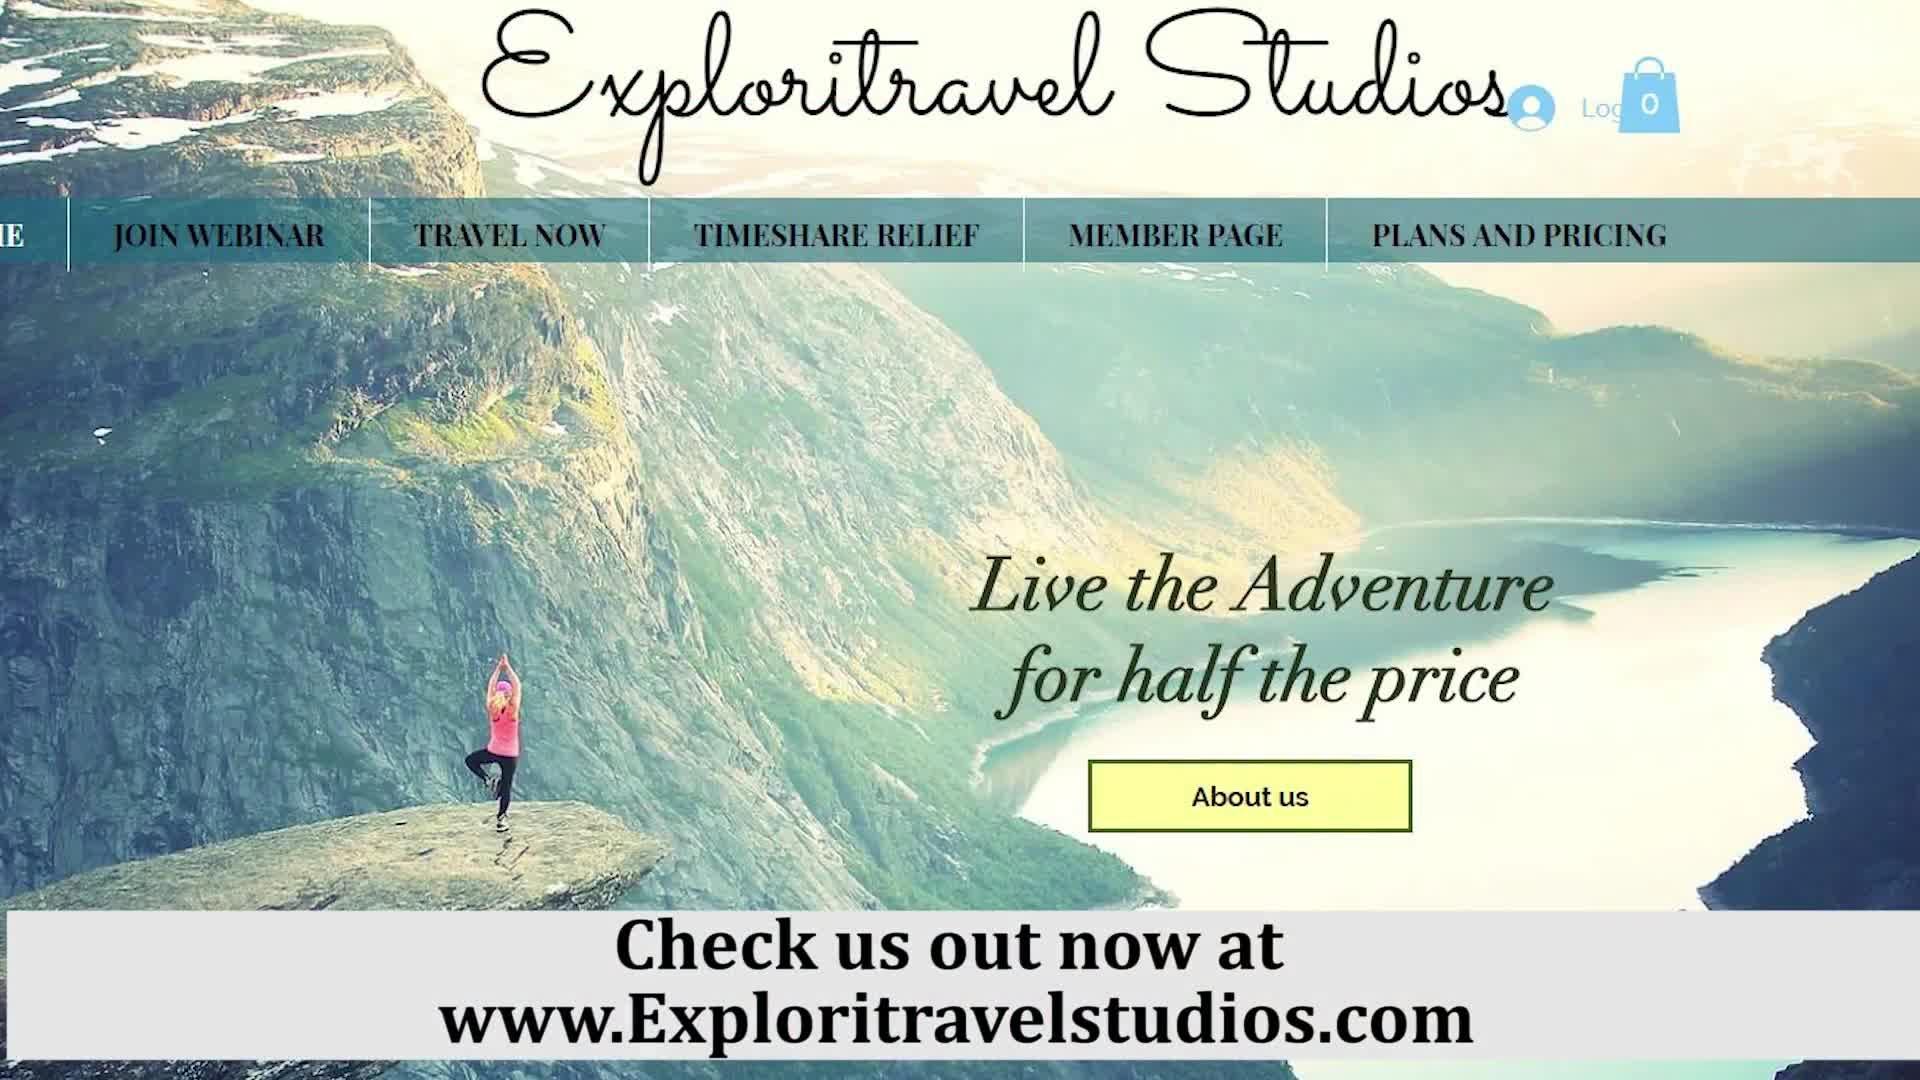 Exploitravel Studios Commercial